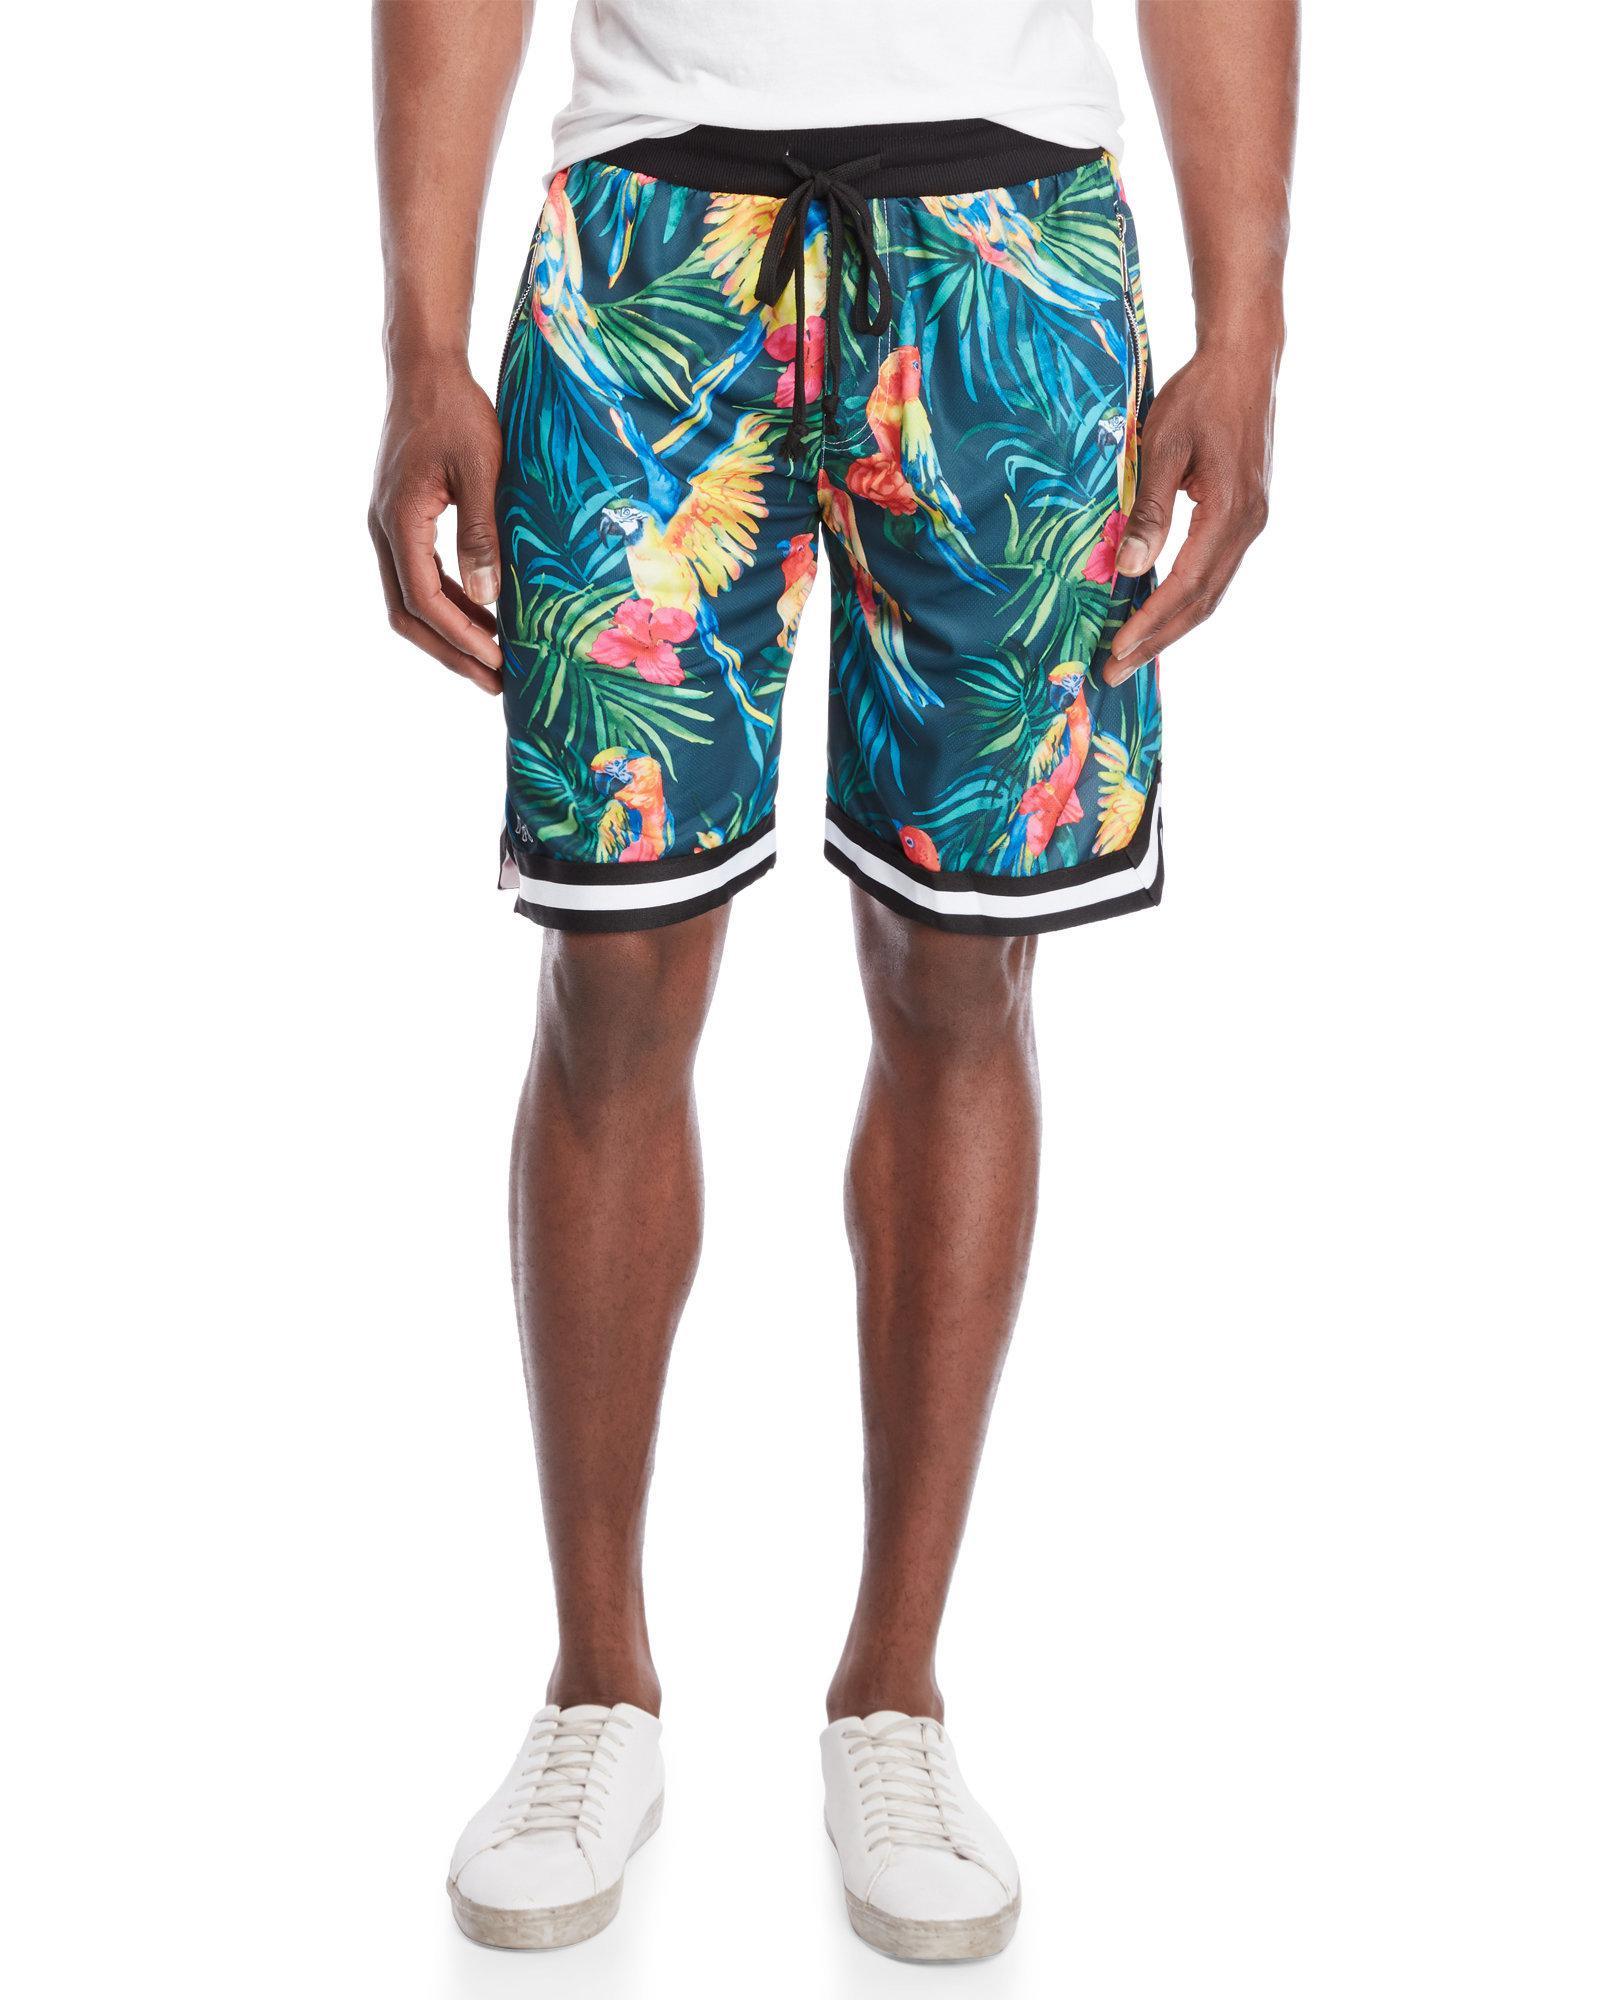 American Stitch. Men's Blue Tropical Drawstring Shorts